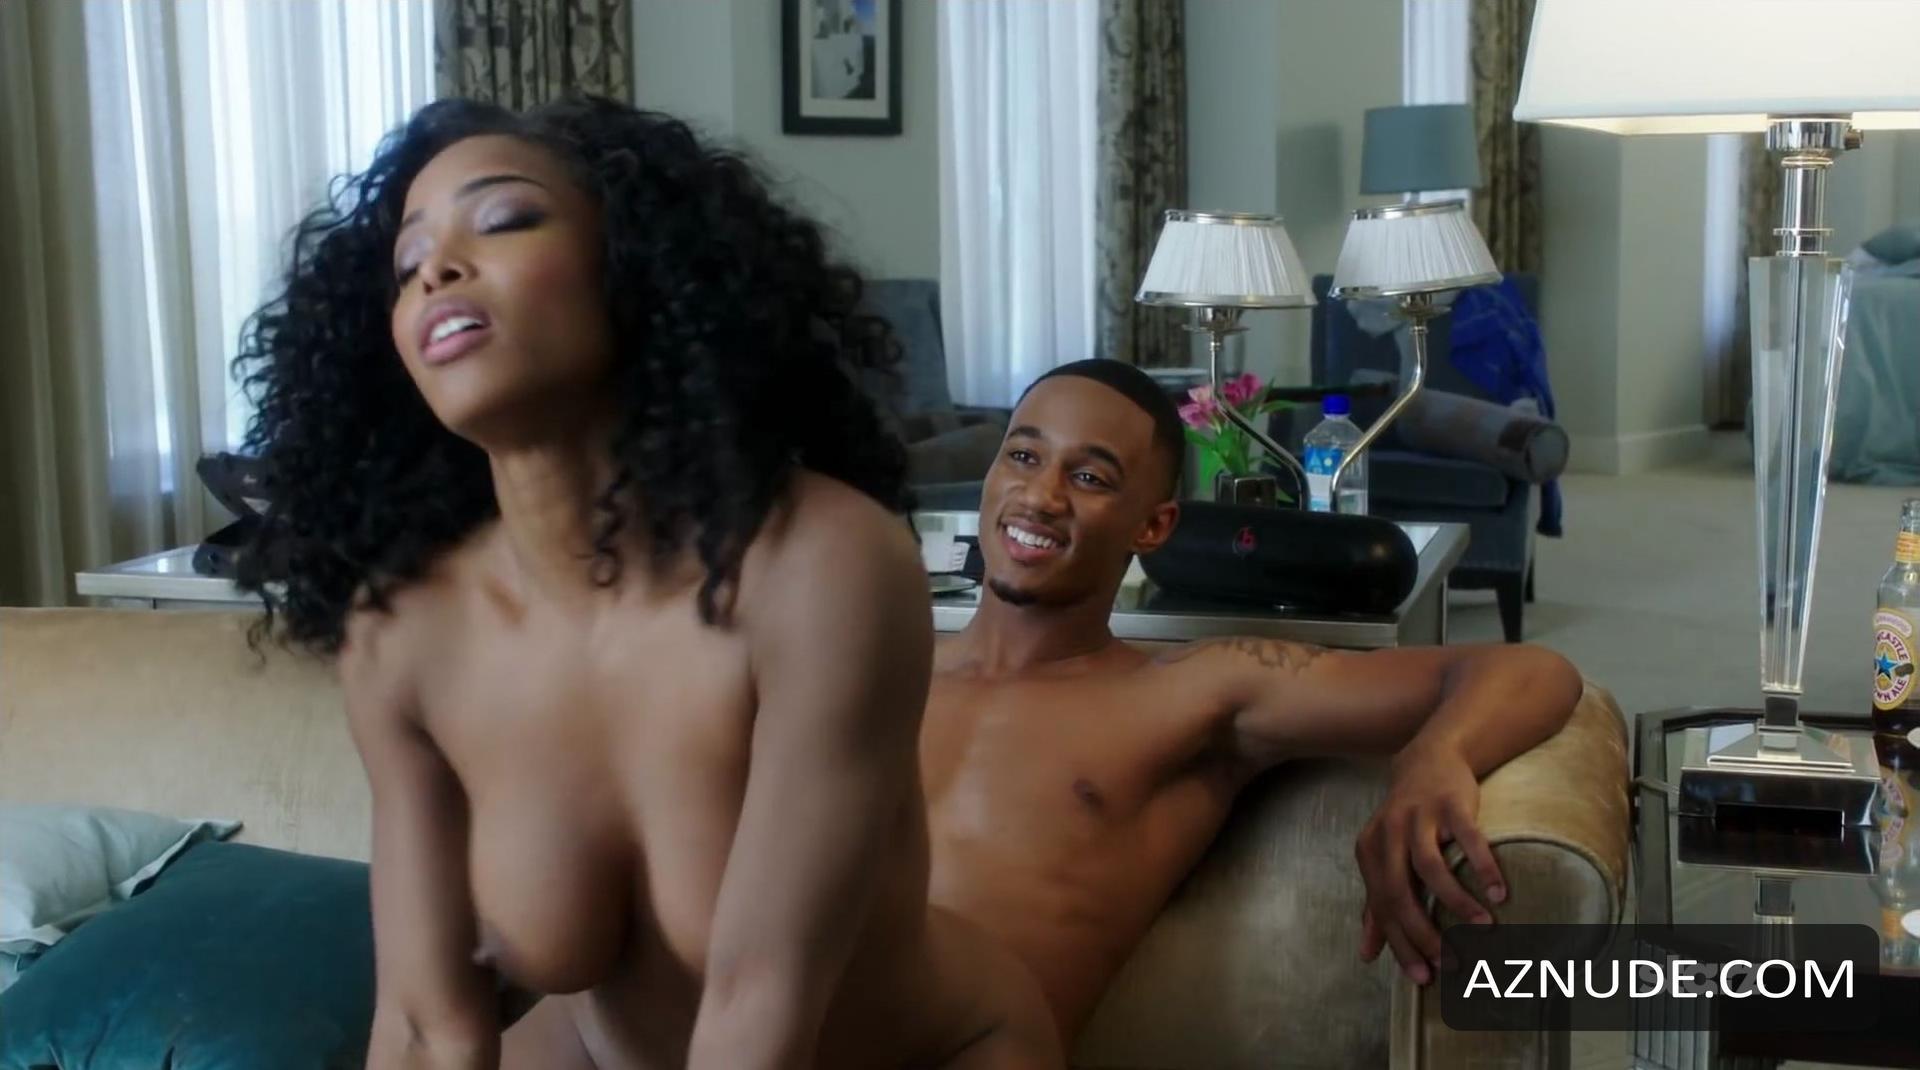 University of virginia girls nude